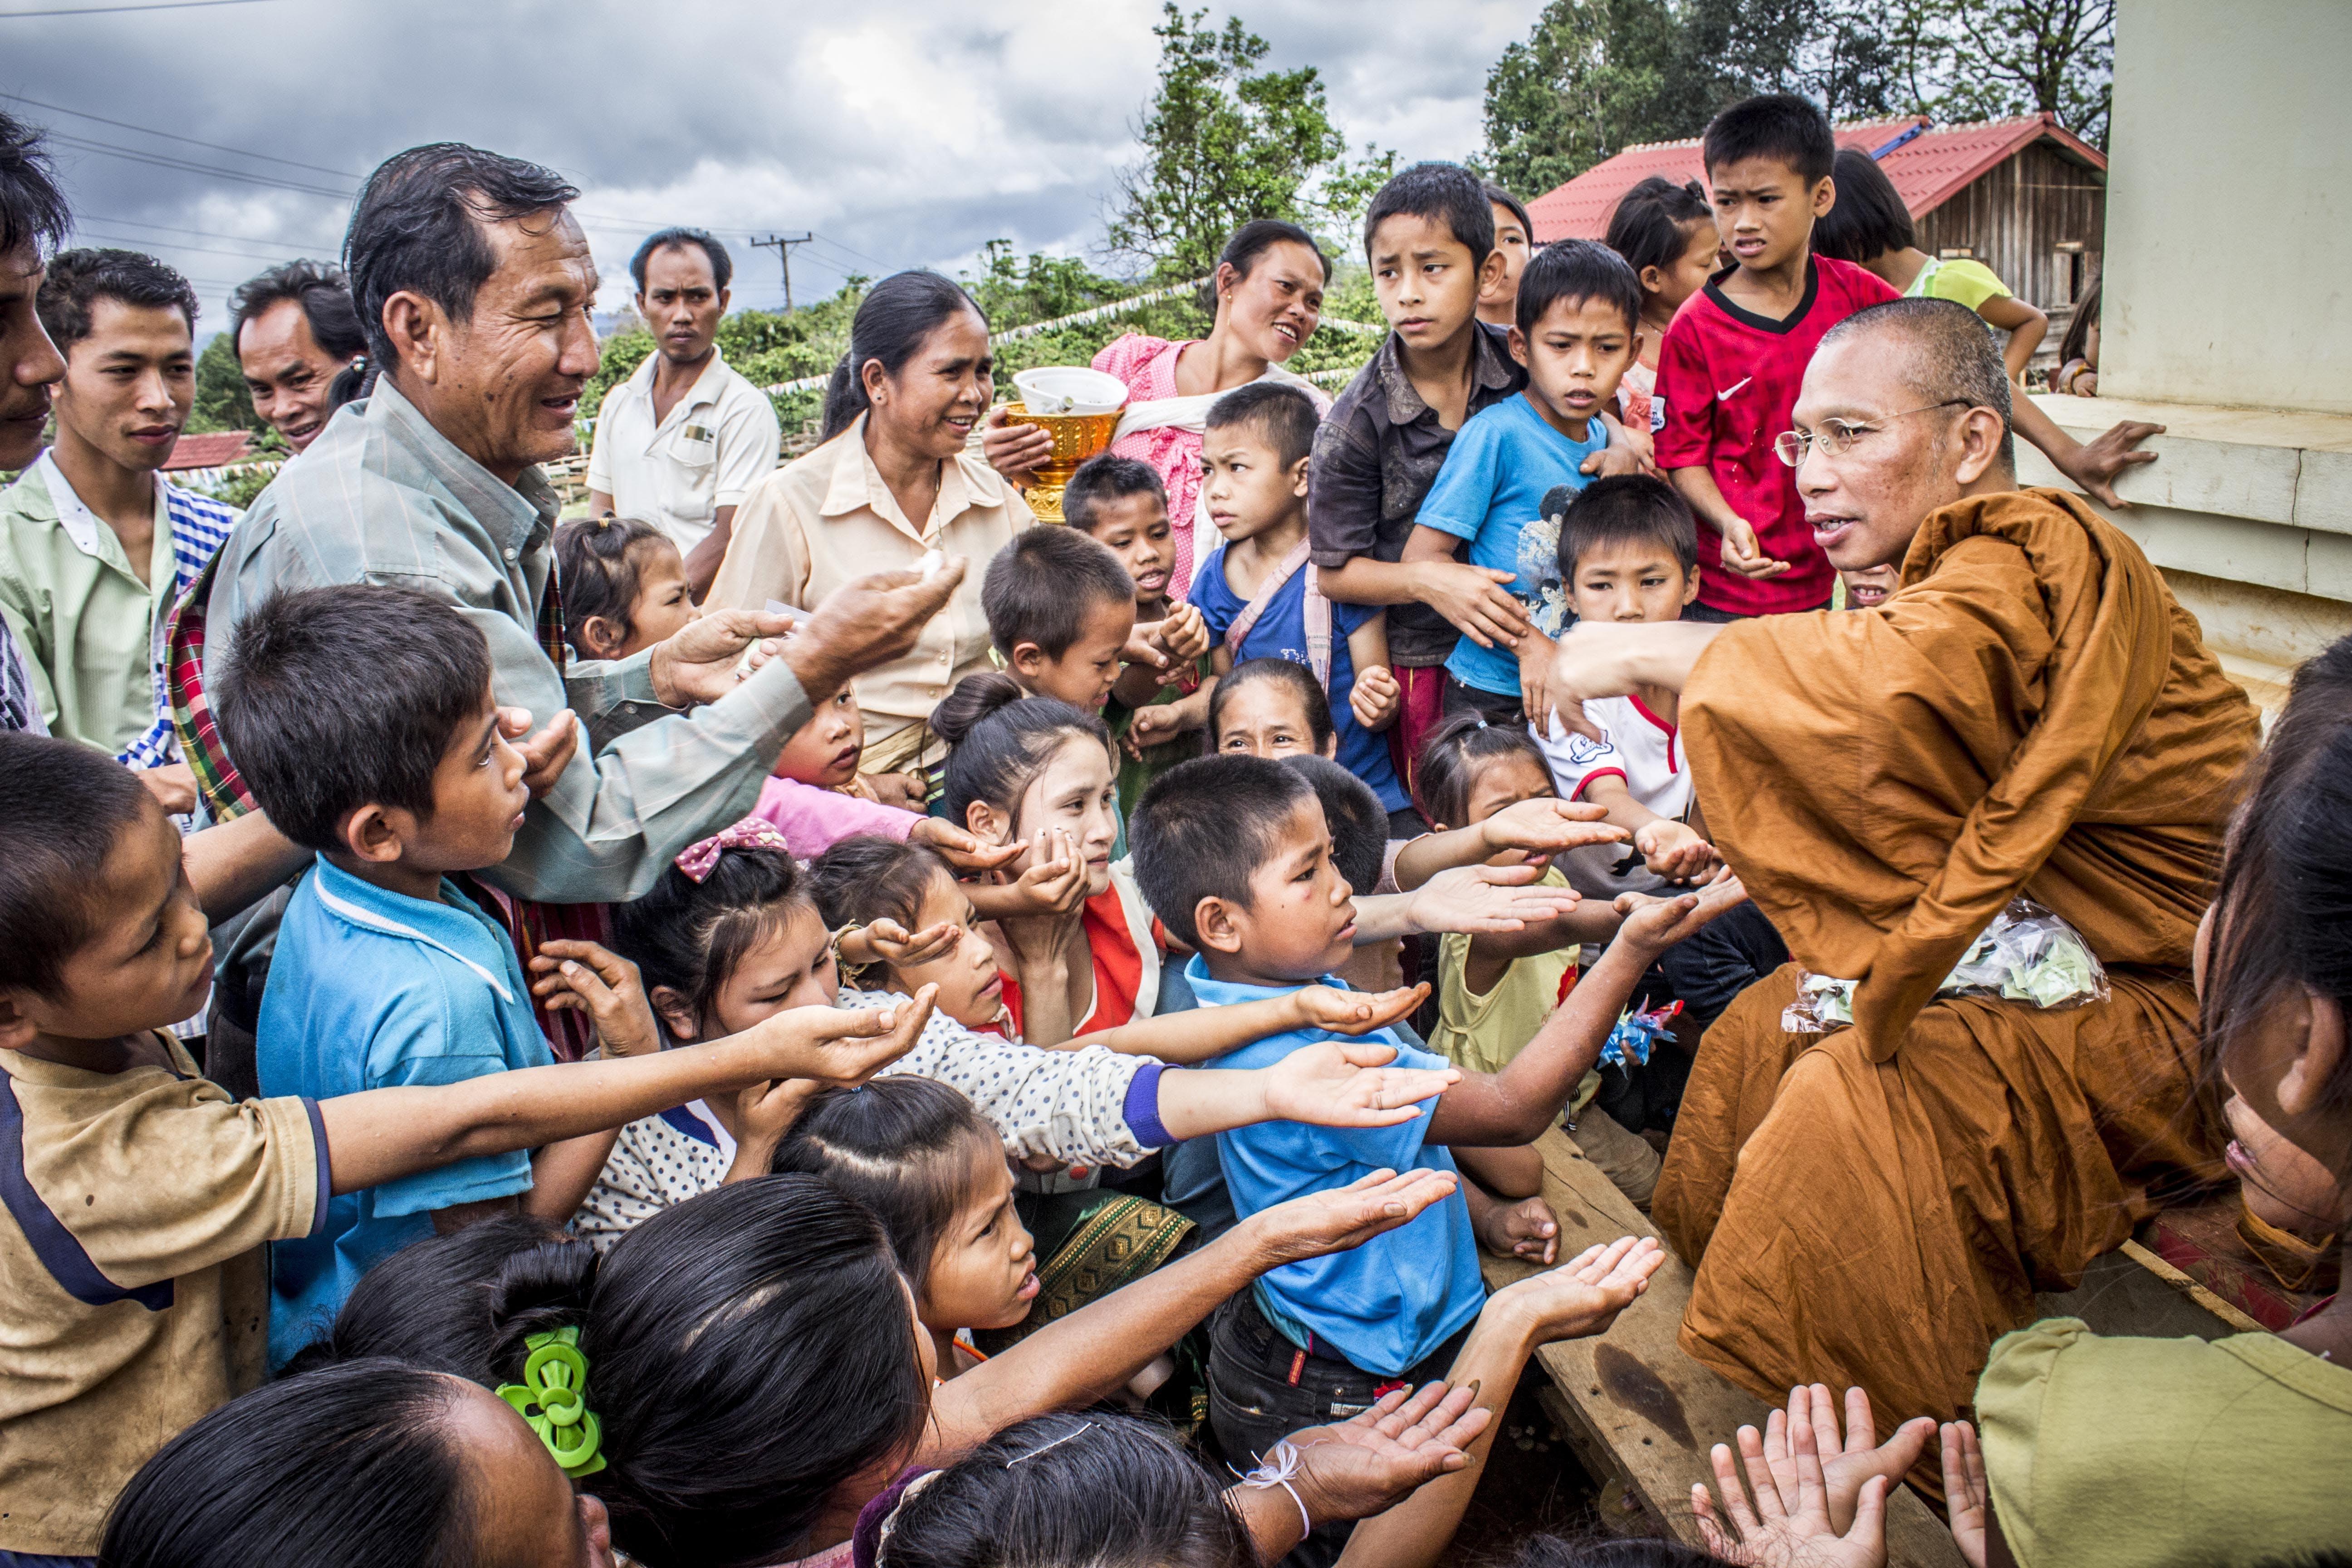 Group of Children Raising Their Palm Towards a Man